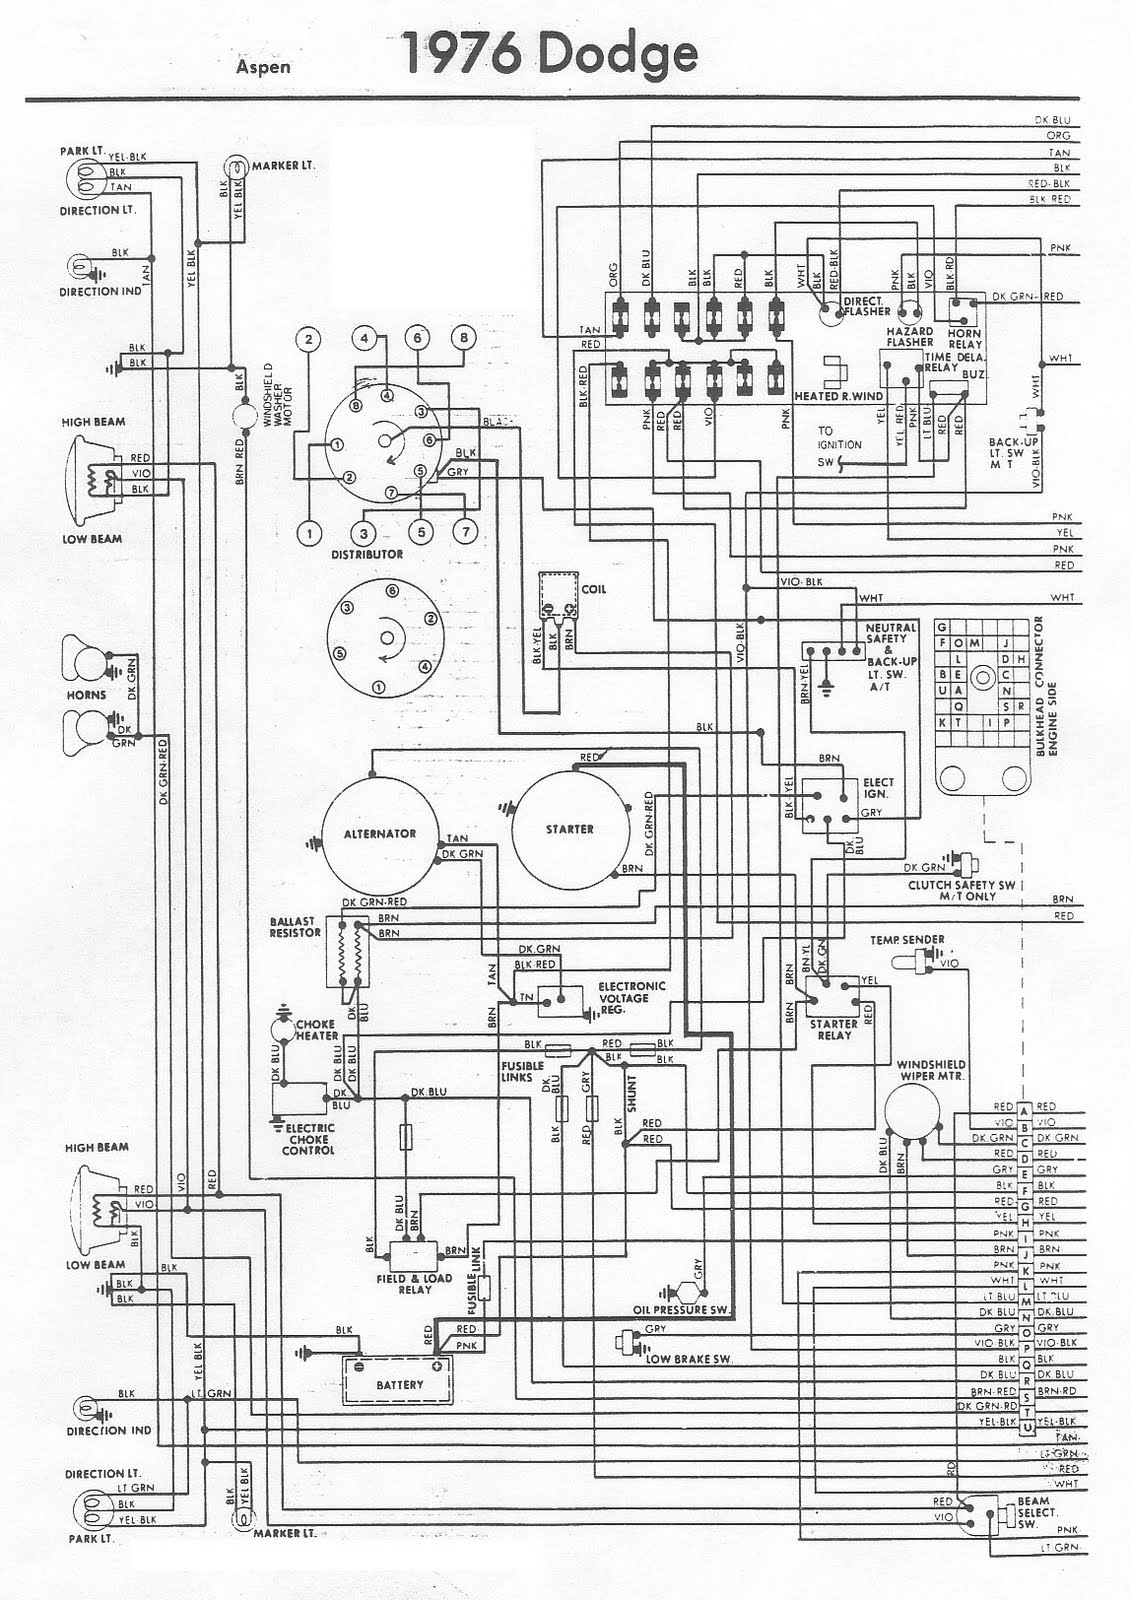 Free Auto Wiring Diagram: 1976 Dodge Aspen Engine Compartment Wiring Diagram